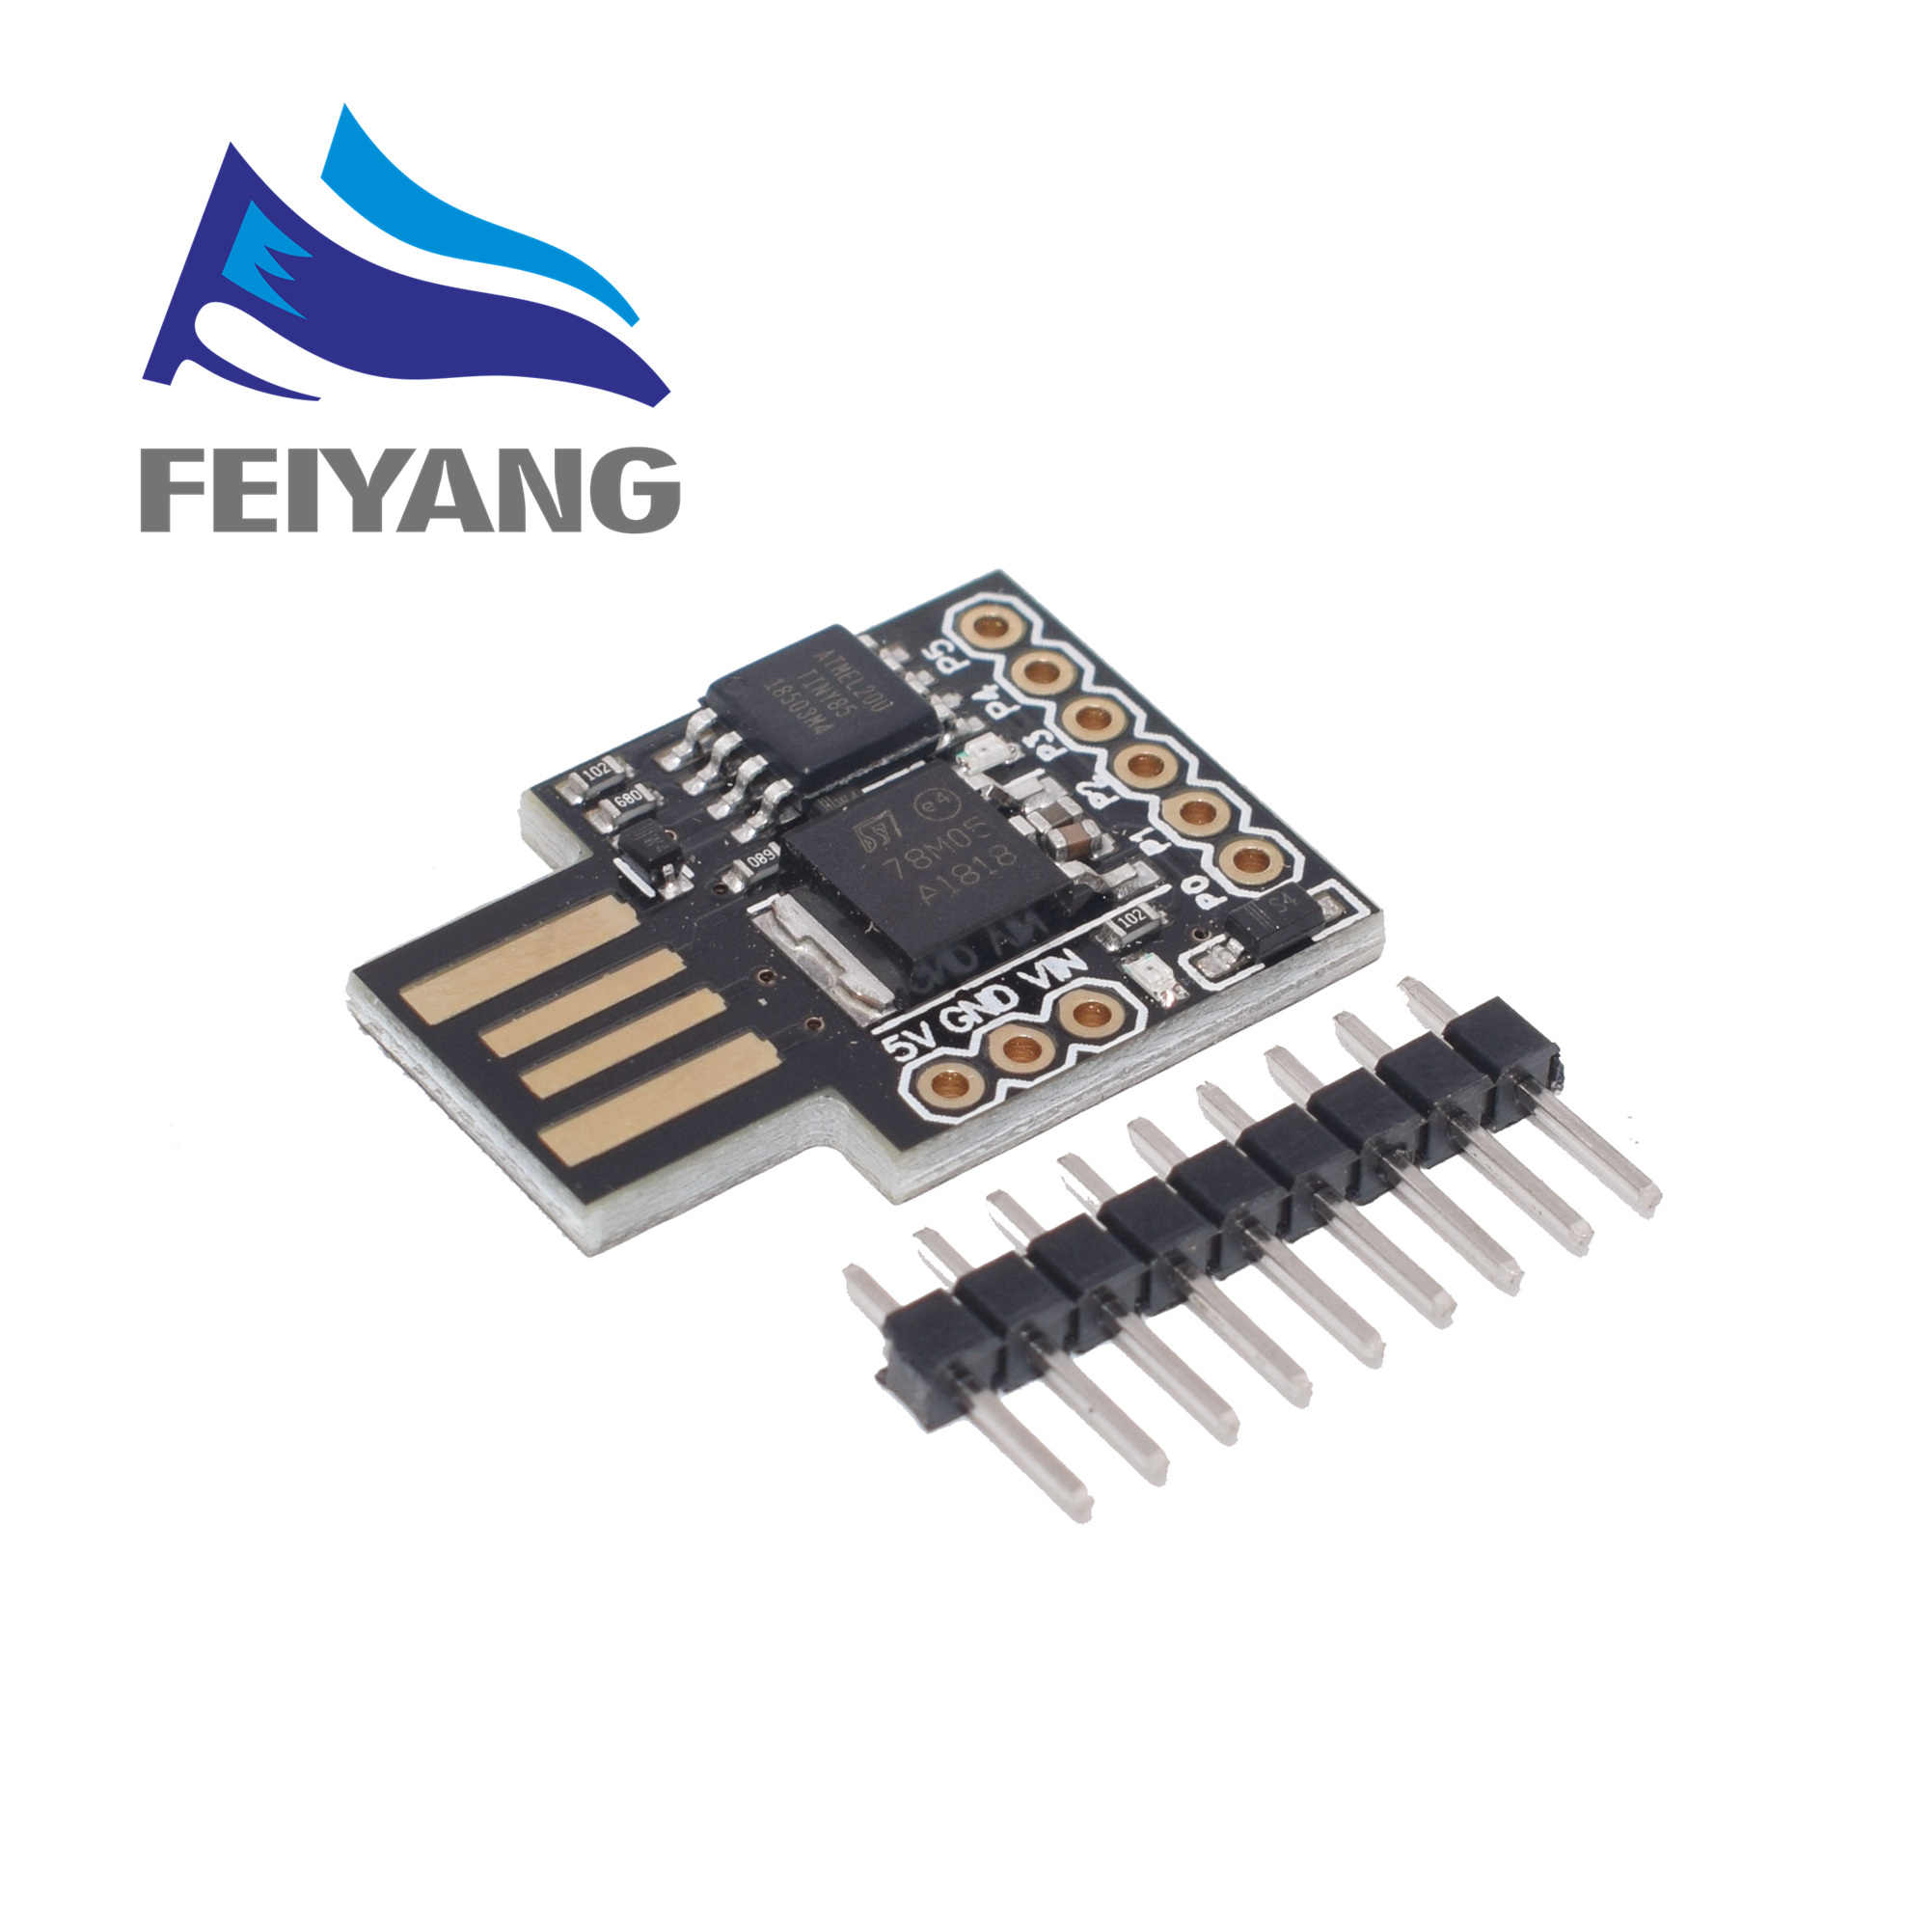 1 pièces bleu noir TINY85 Digispark Kickstarter Micro carte de développement ATTINY85 module pour Arduino IIC I2C USB